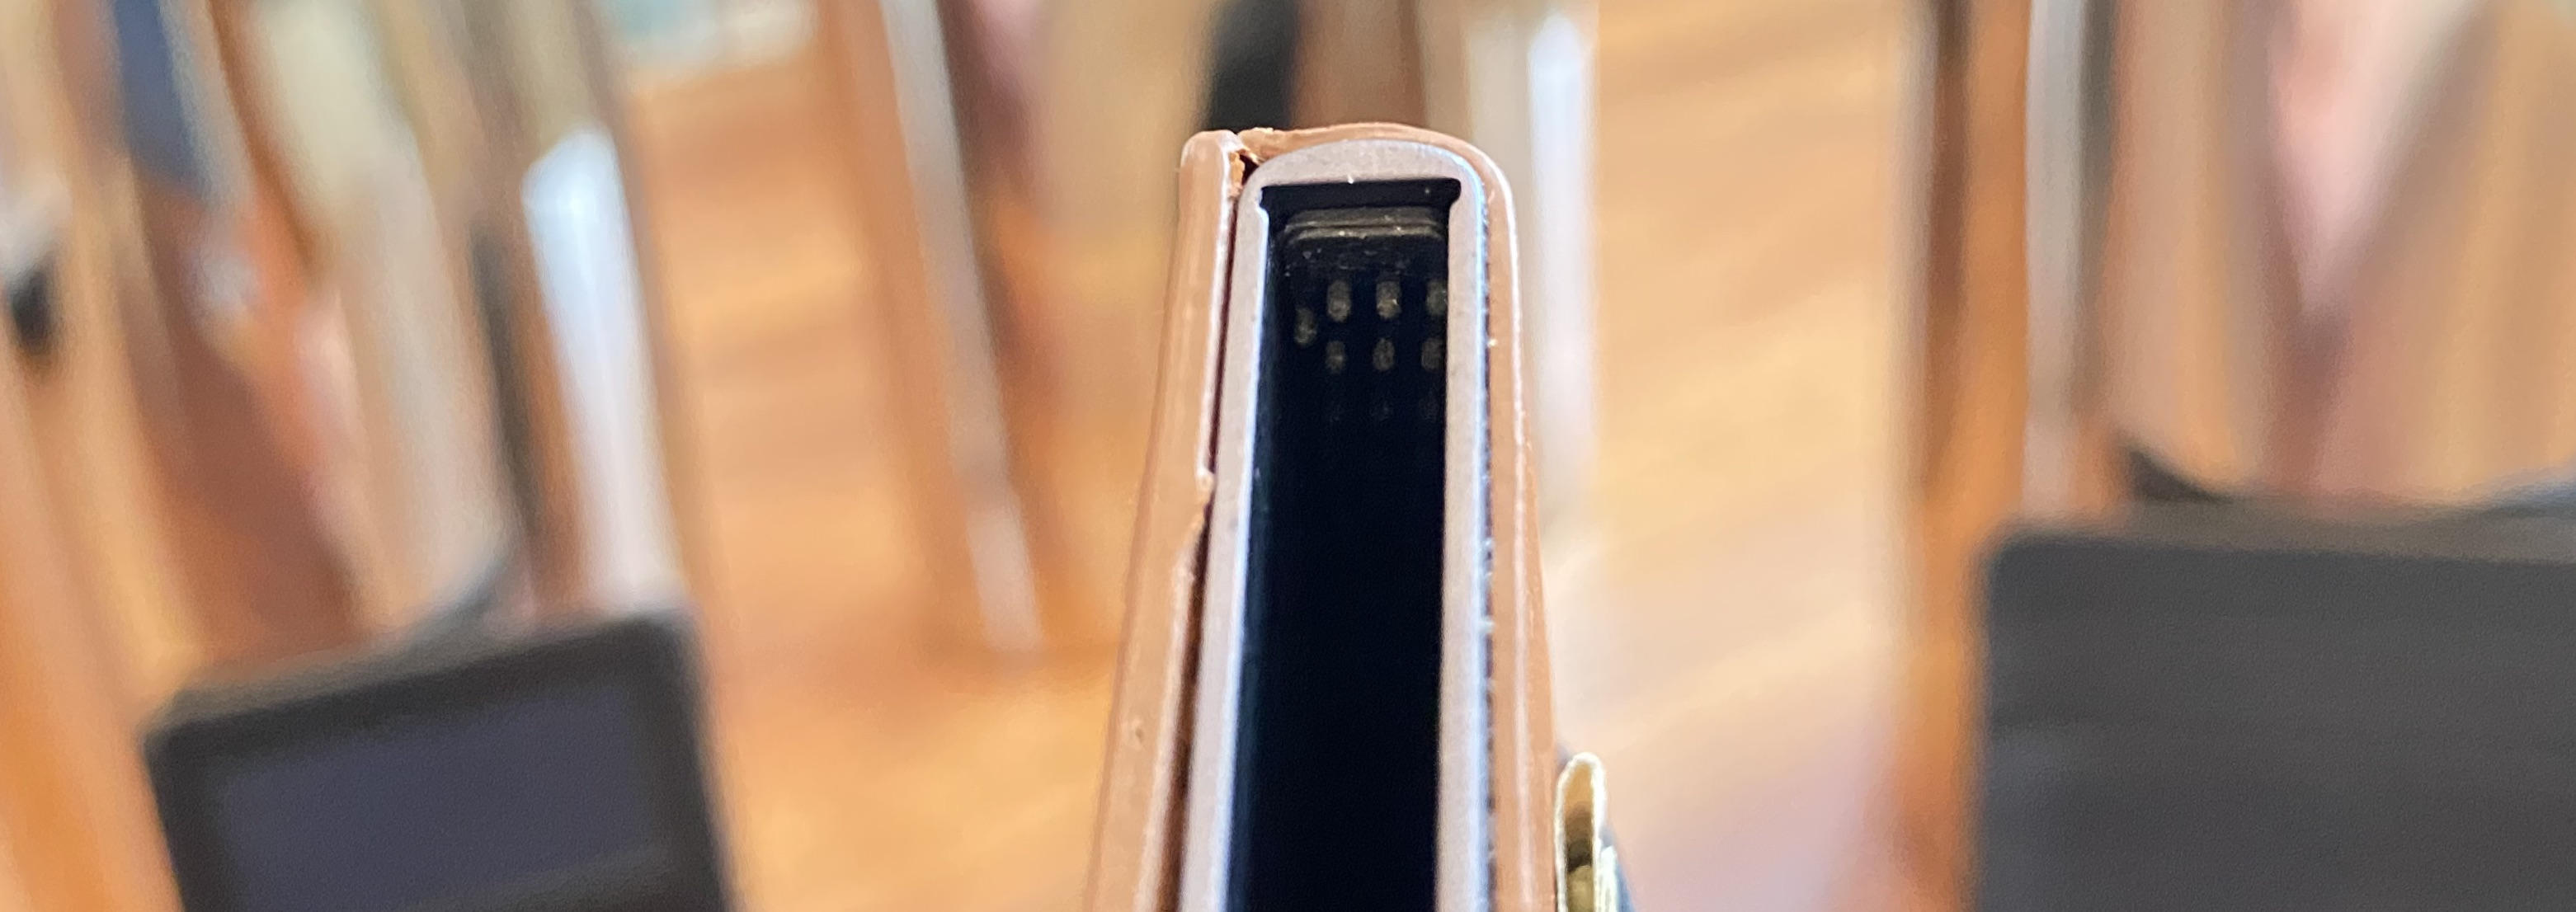 Ekster smart Siri wallet review quick access mechanism rubber nubs spine